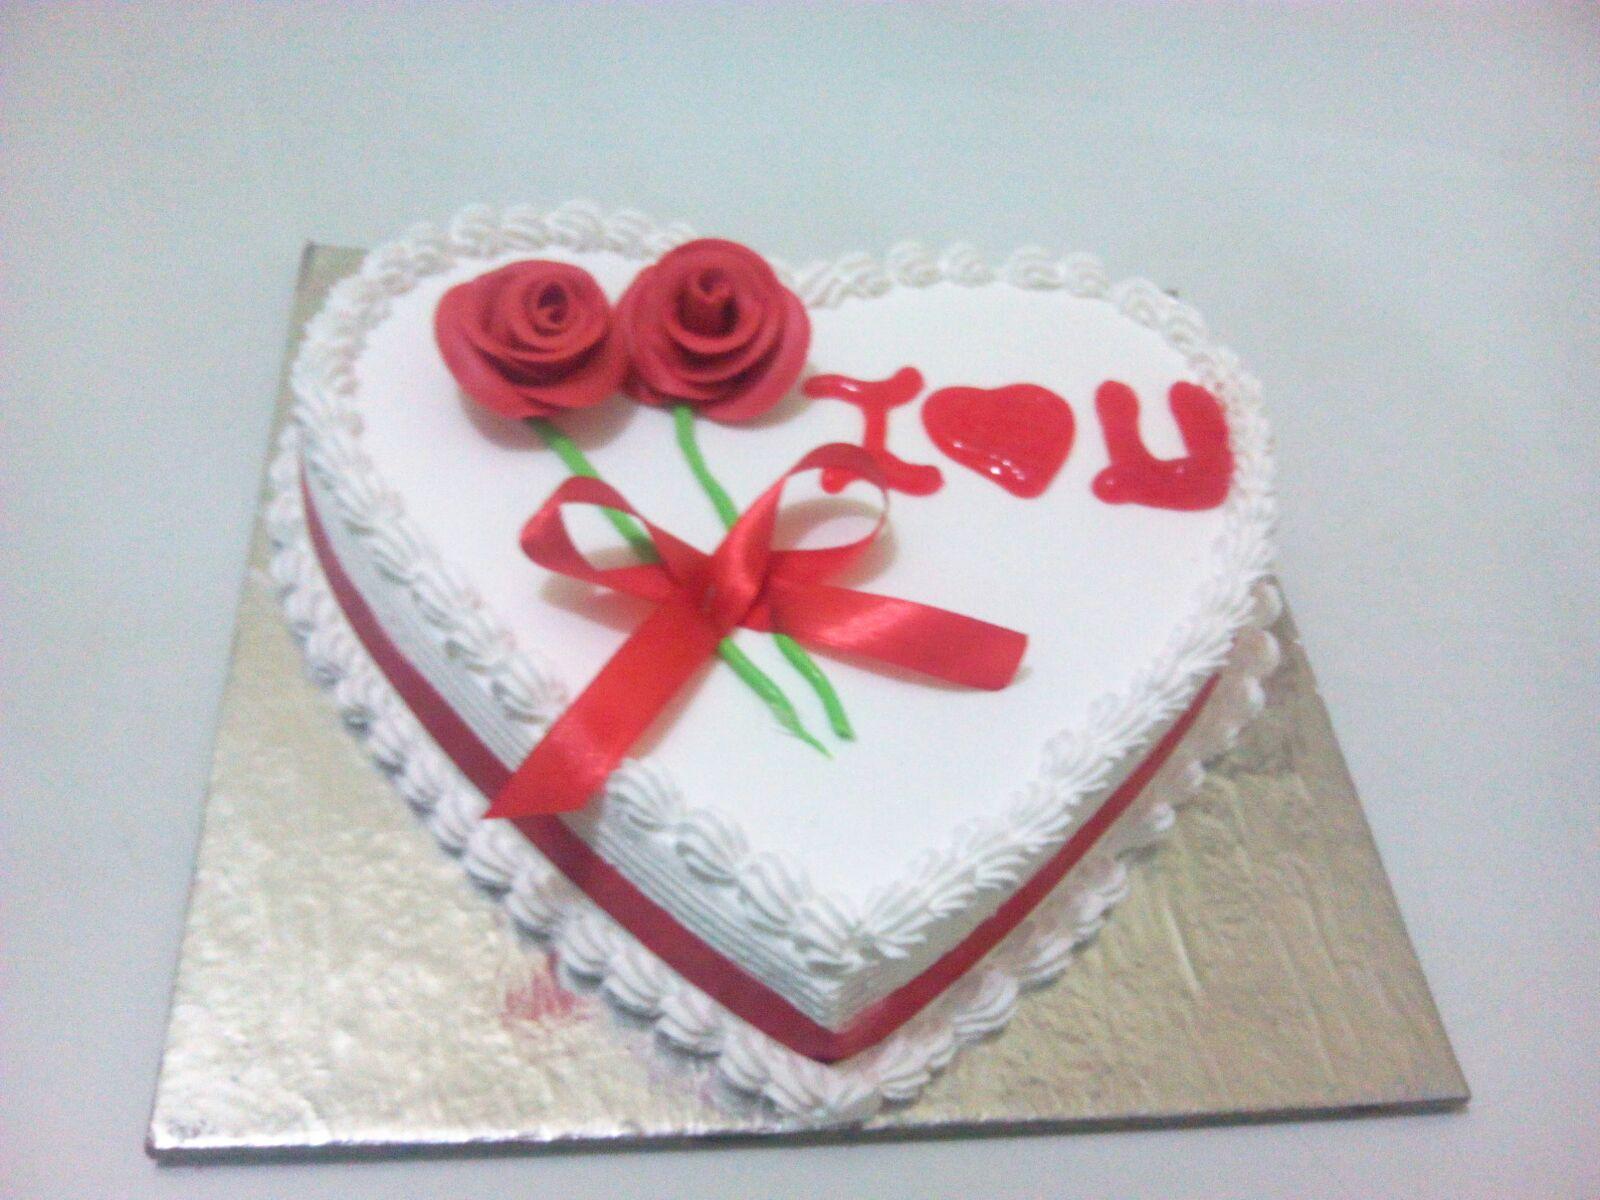 Bristol anniversary cakes emersons green anniversary cakes